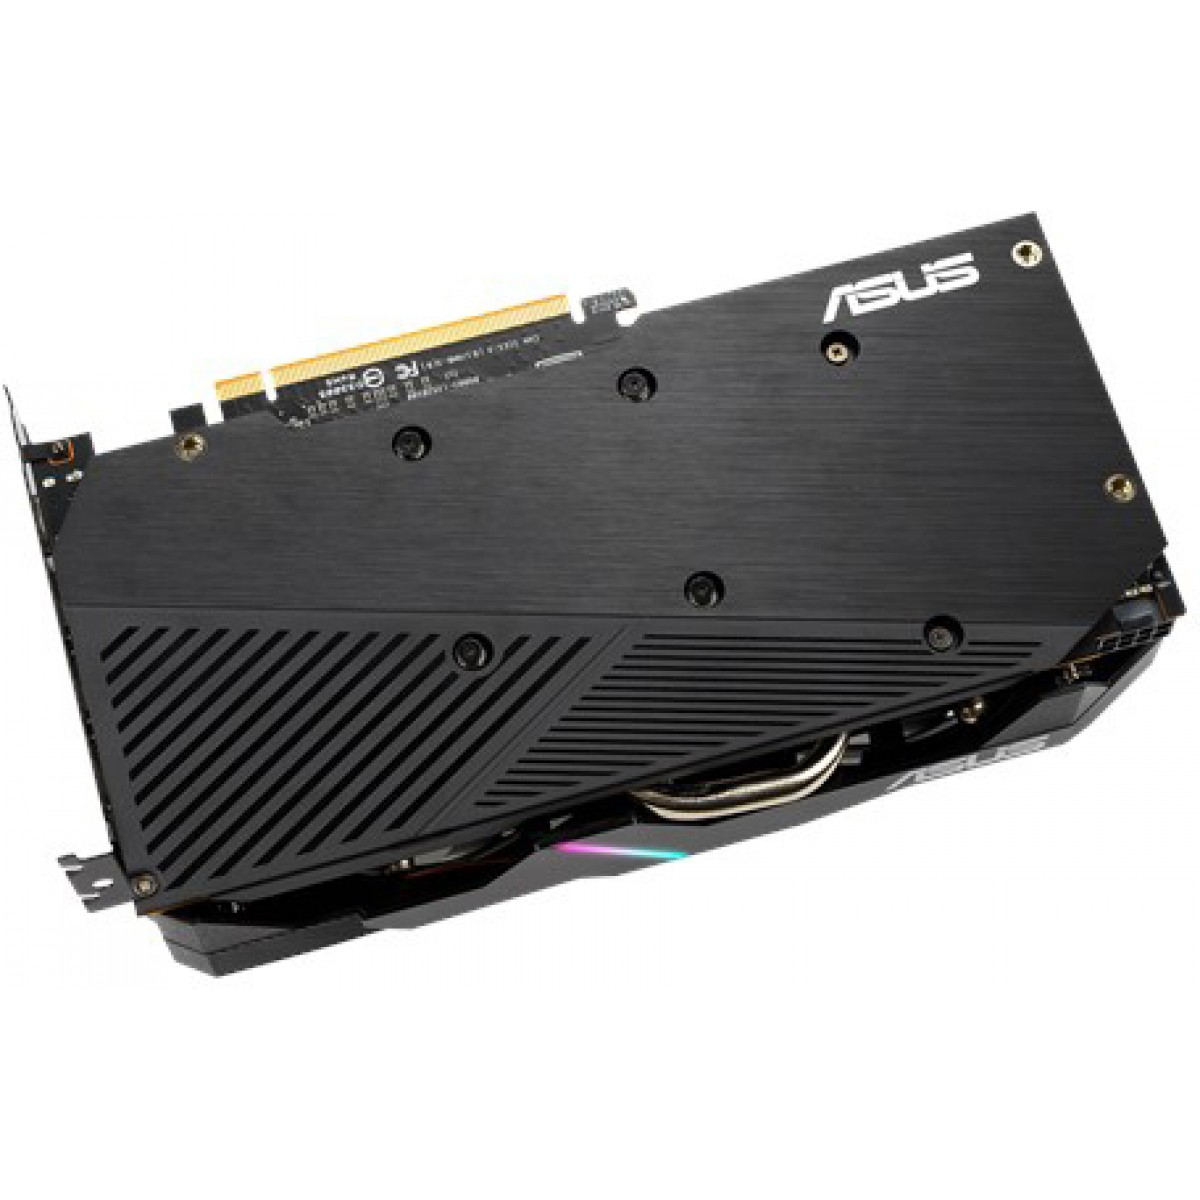 Placa de Vídeo Asus, Radeon, RX 5500 XT EVO, 4GB, GDDR6, 128Bit, DUAL-RX5500XT-O4G-EVO